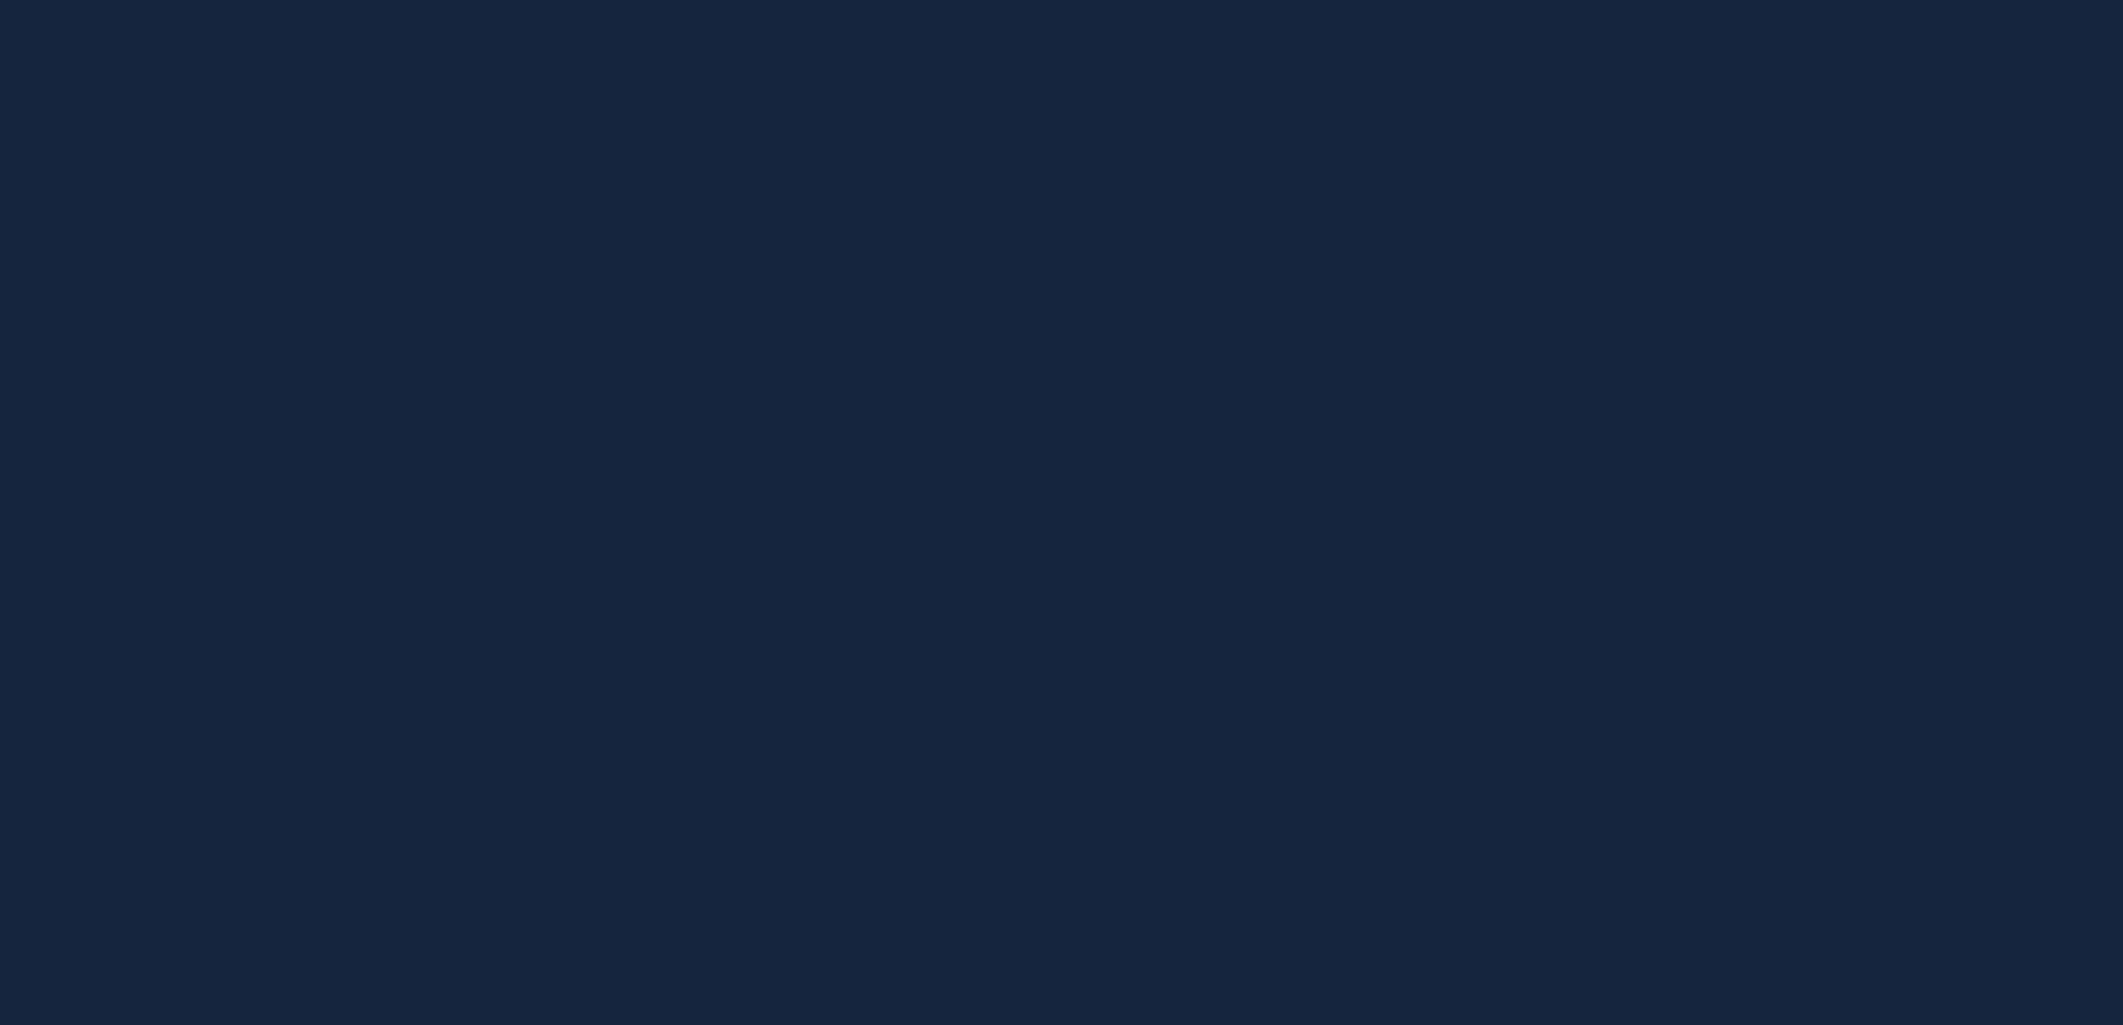 Mont Saint-Joseph (Carleton-sur-mer)